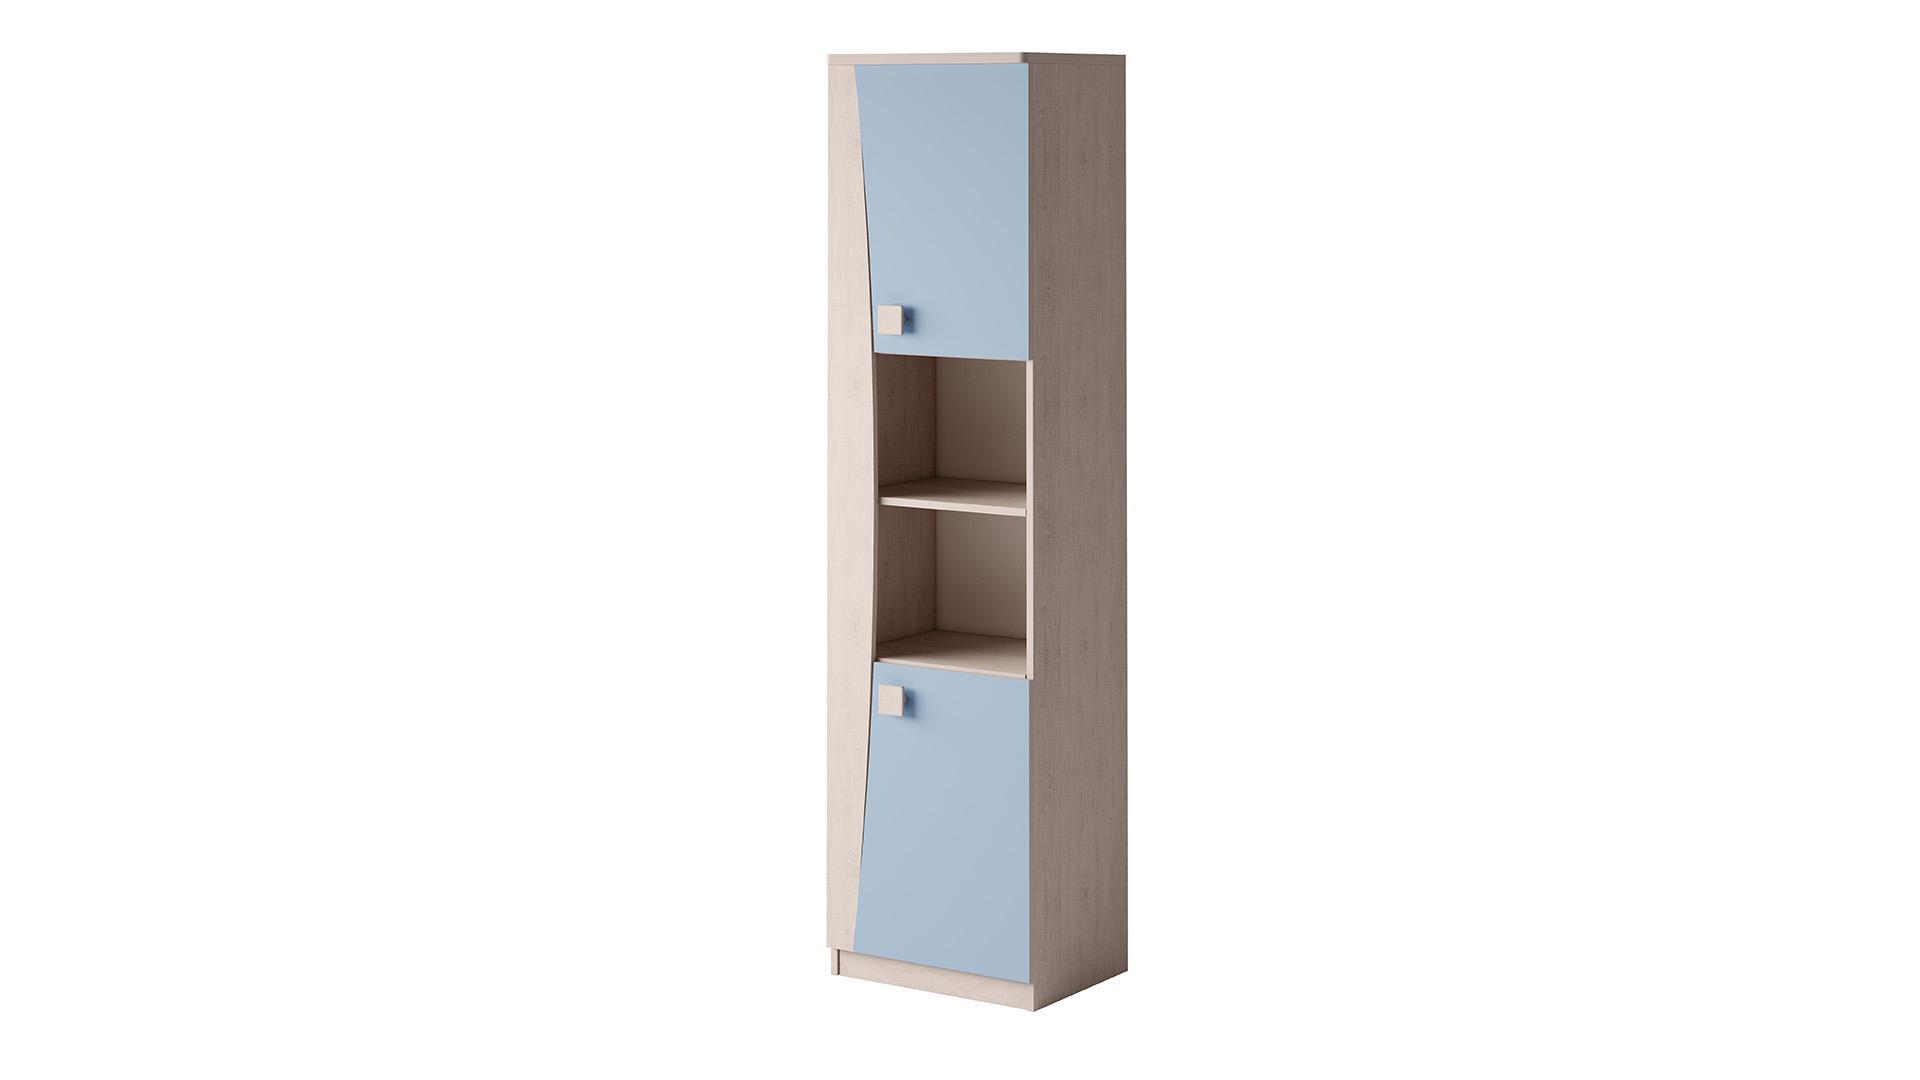 Bookshelf TENUS TN3   MEBLINE FURNITURECOUK 1920x1080